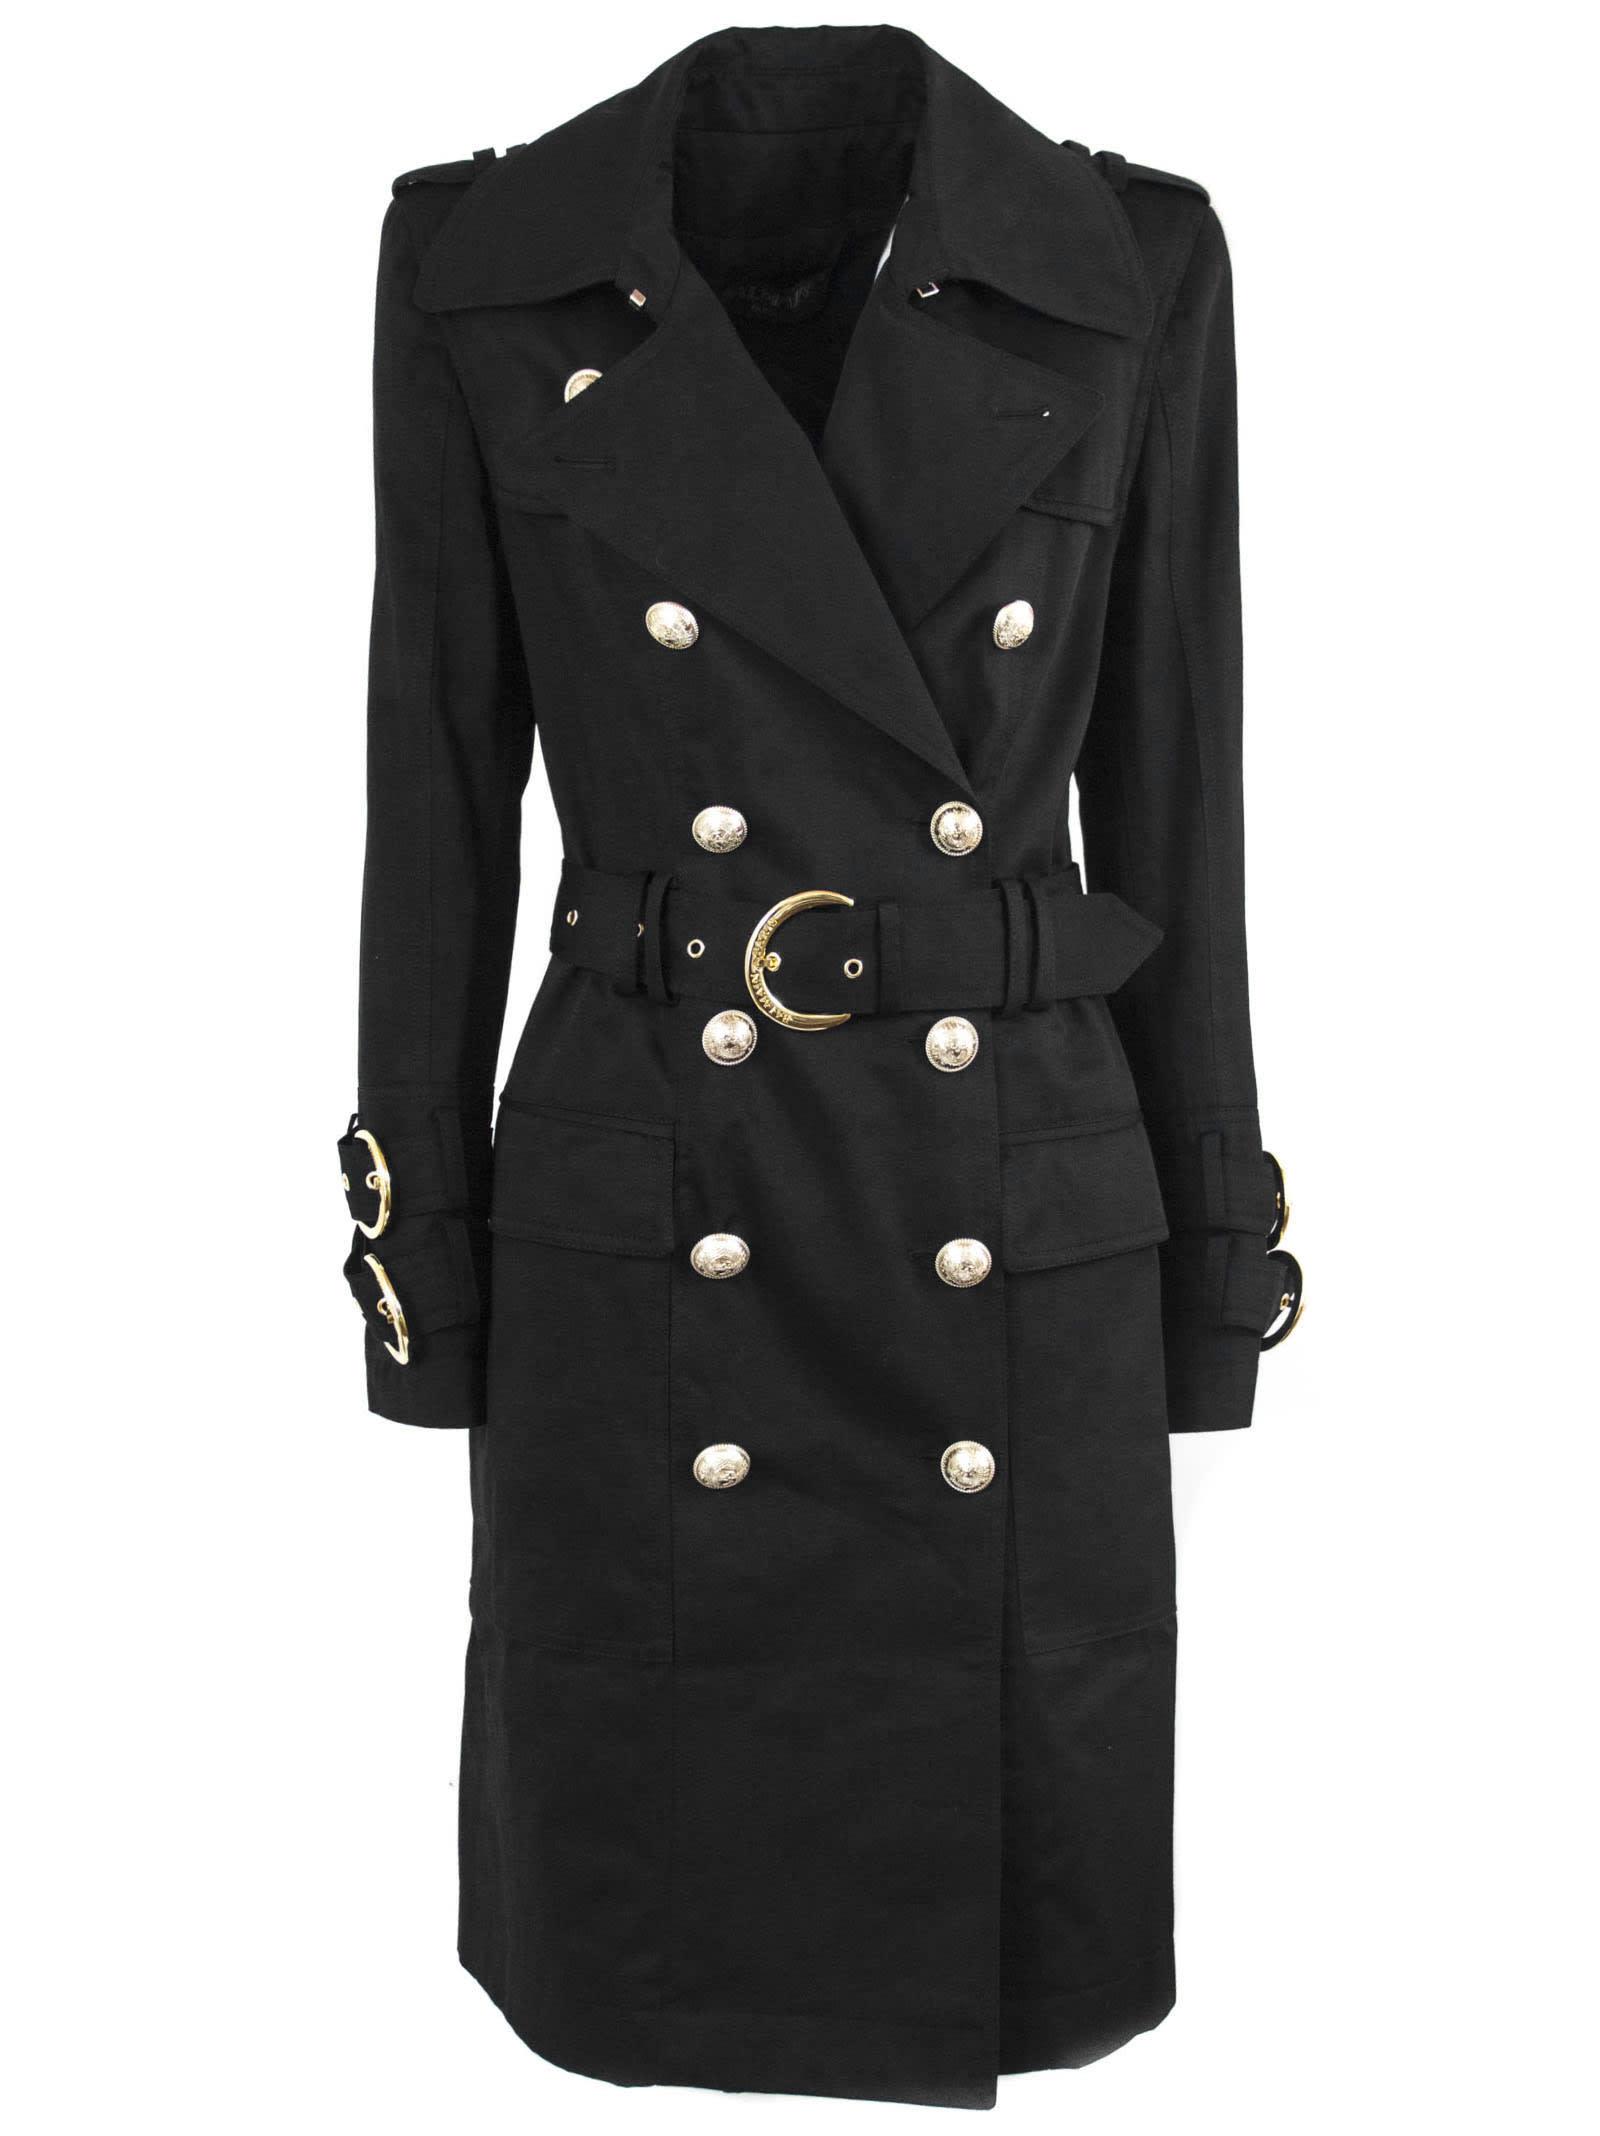 Balmain Long Black Cotton Trench Coat